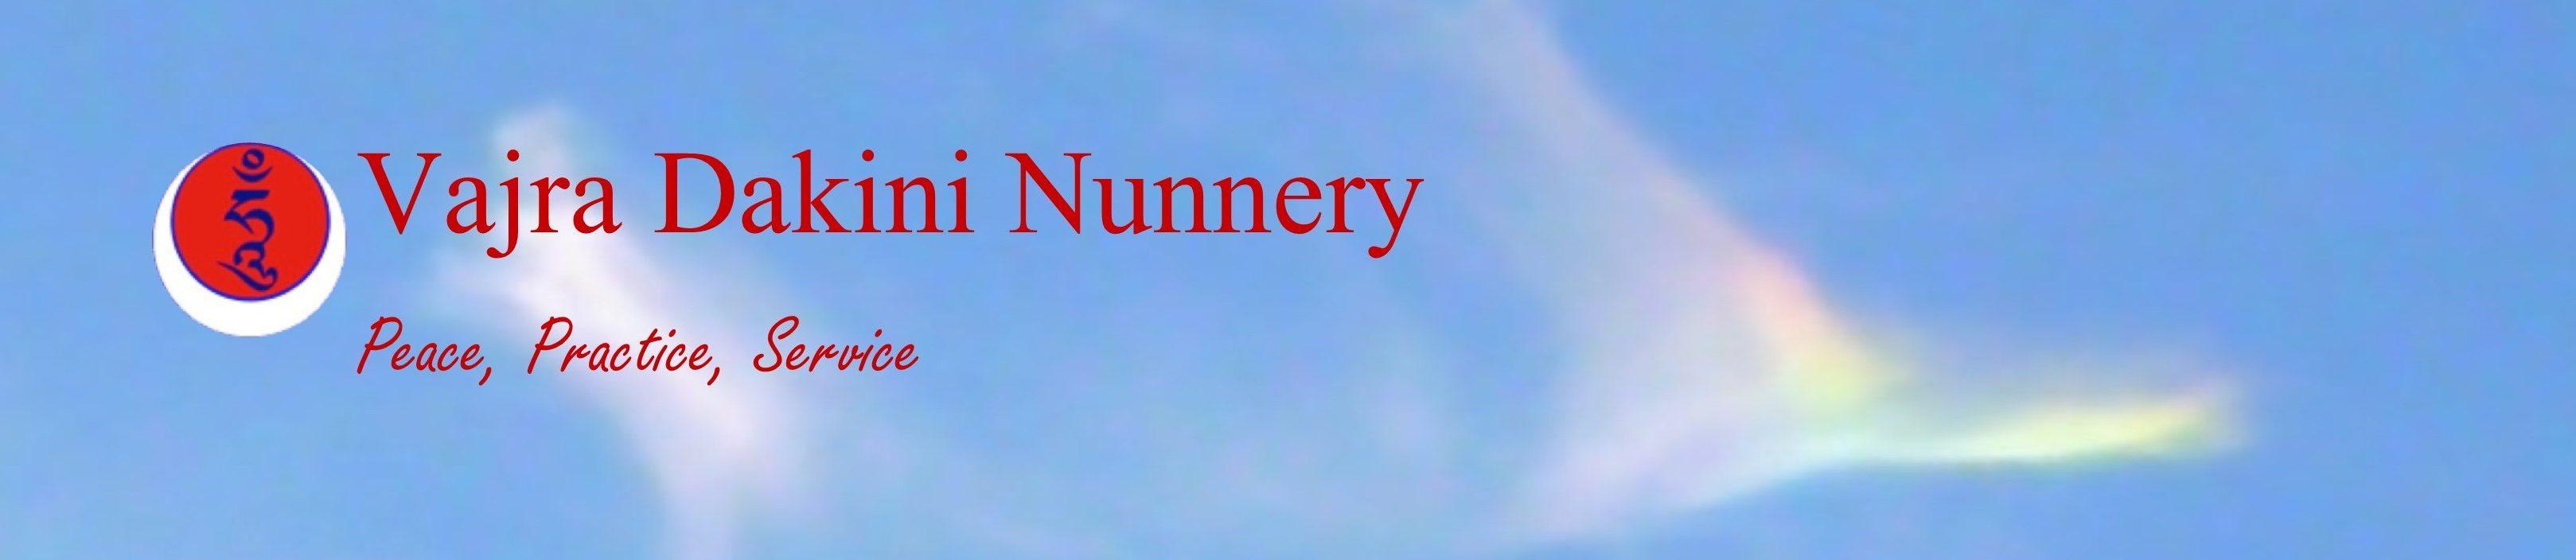 Vajra Dakini Nunnery Logo